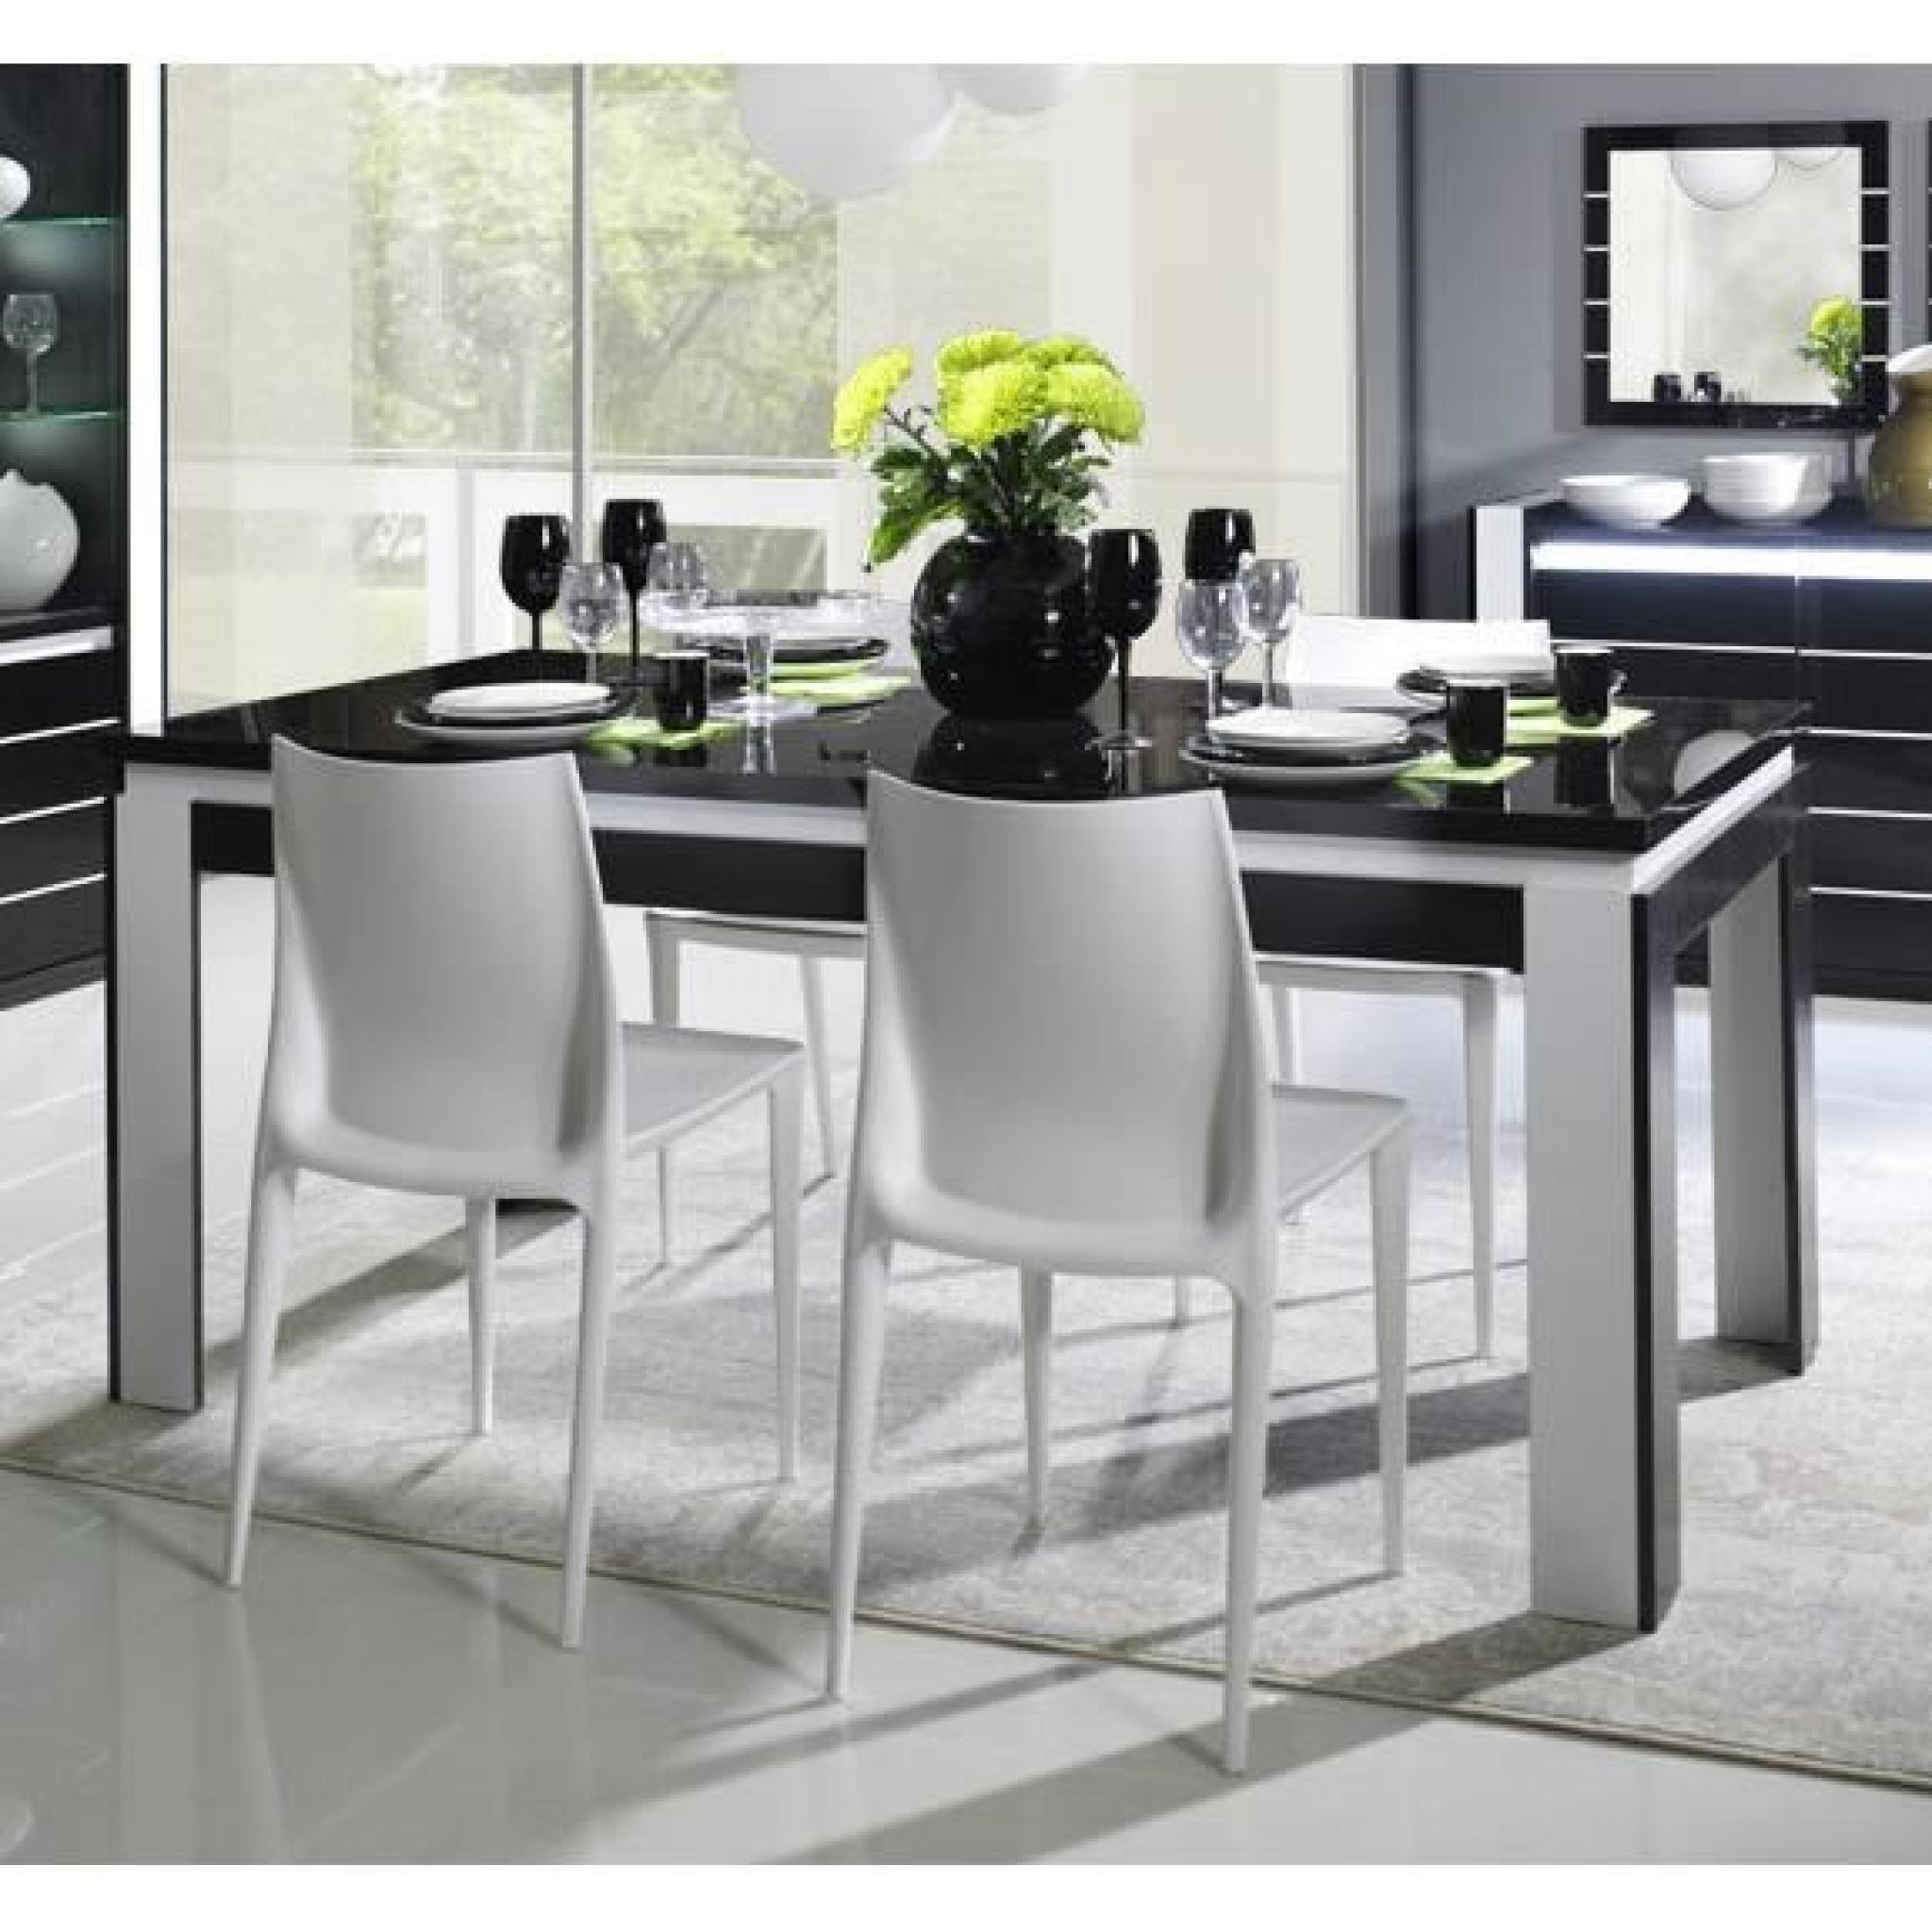 table manger noir et blanc laqu design erica 3 table 160 cm